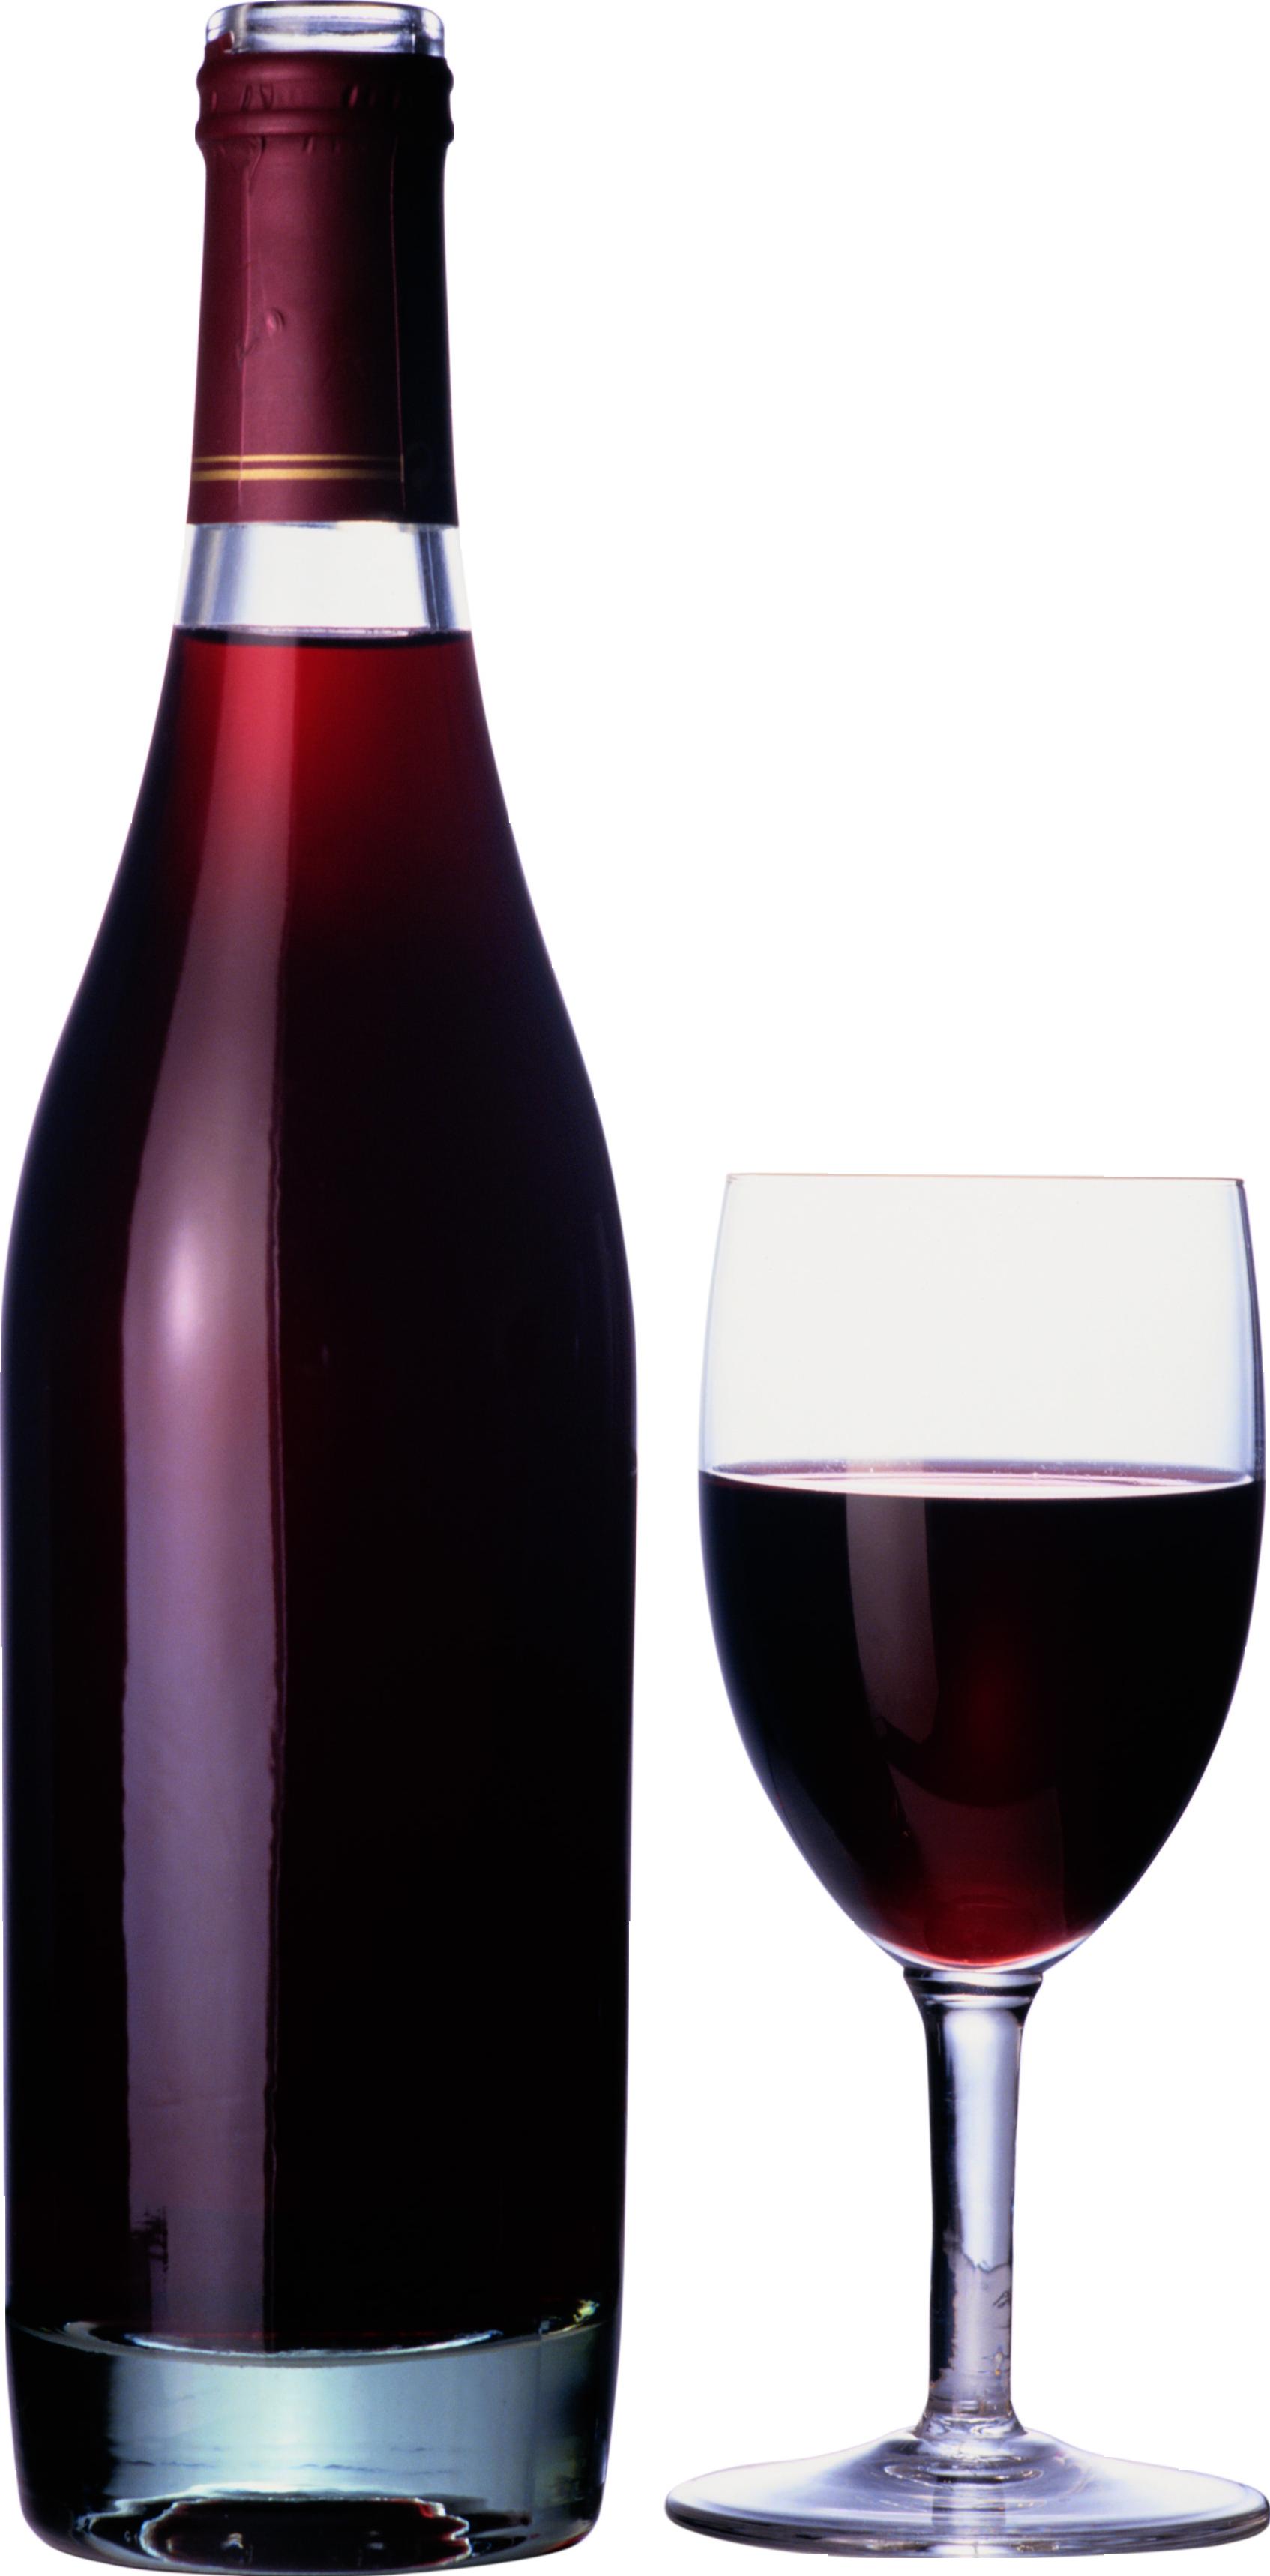 1694x3435 Clipart Wine Bottle